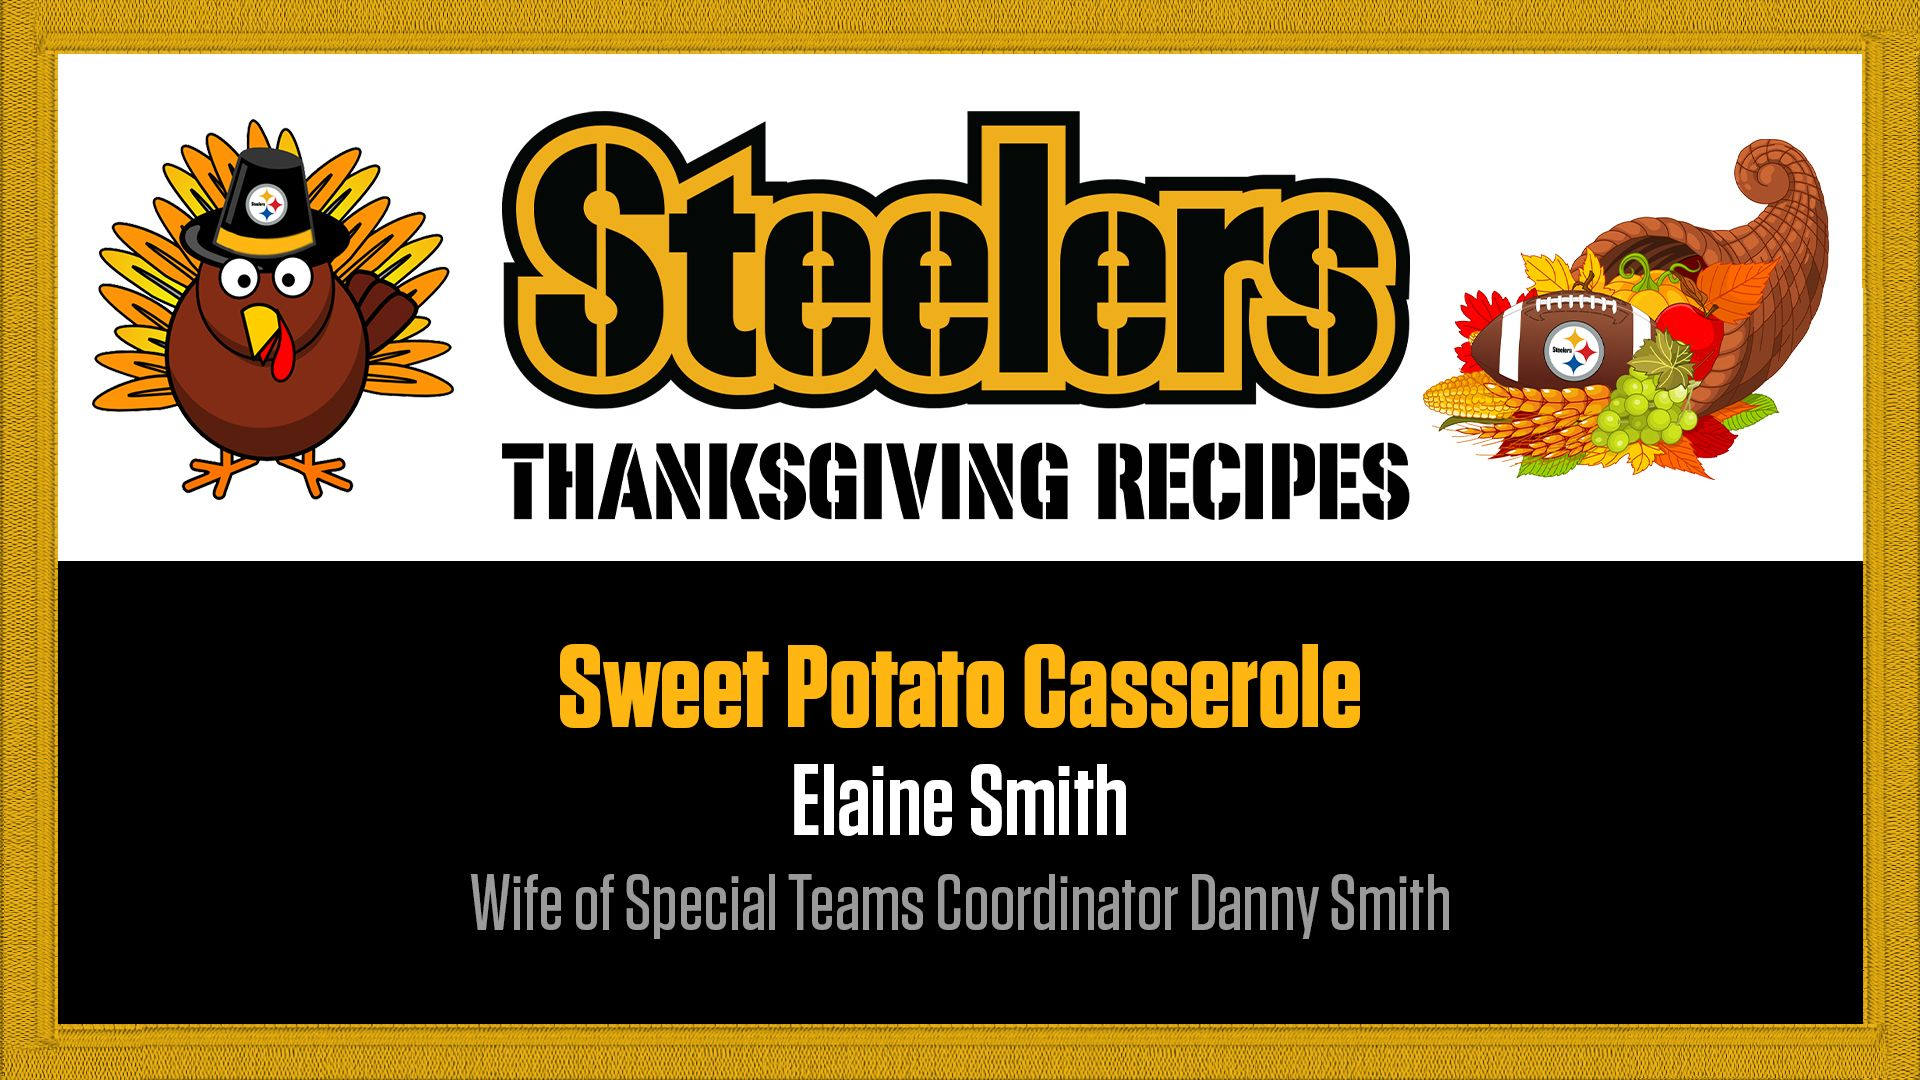 Recipe - sweet potato casserole_elaine smith